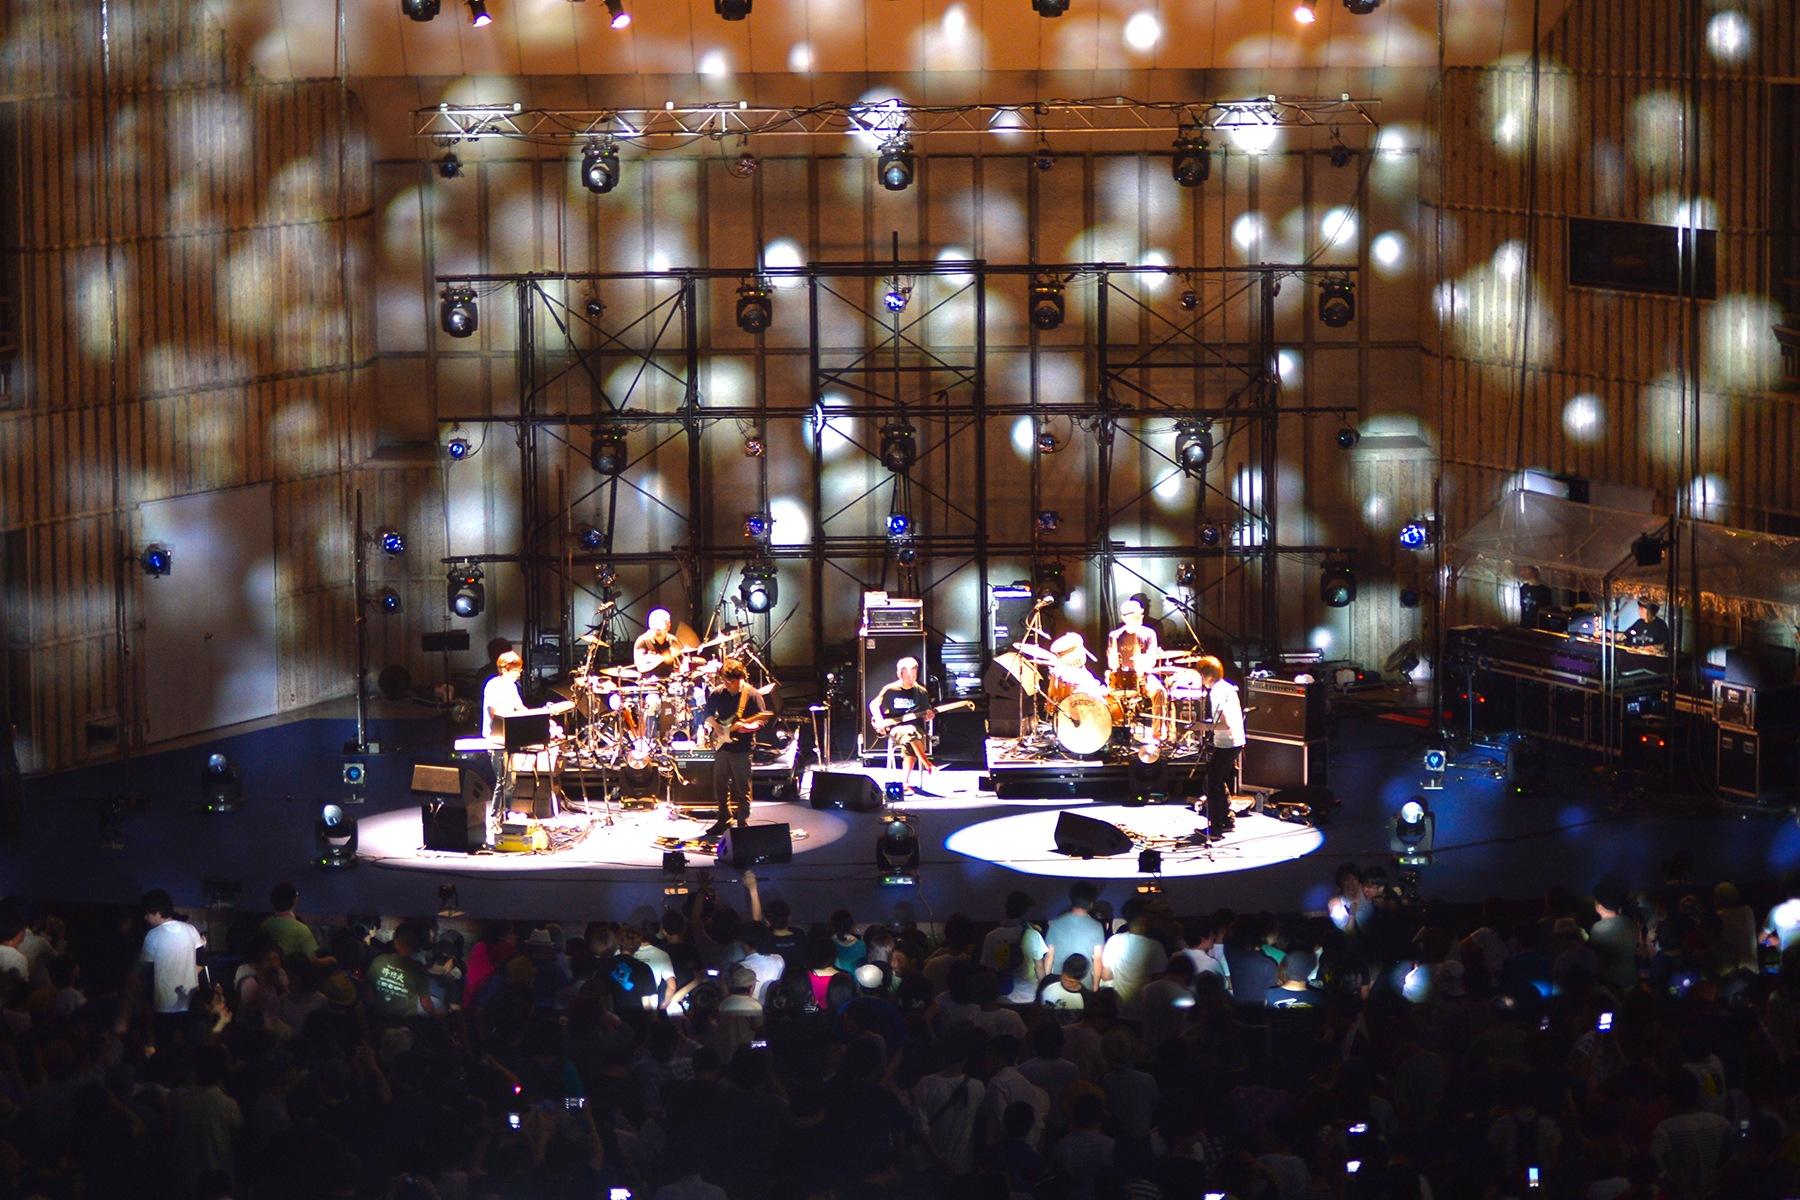 ROVO、結成20周年記念ベスト・セレクション・アルバムをハイレゾ配信